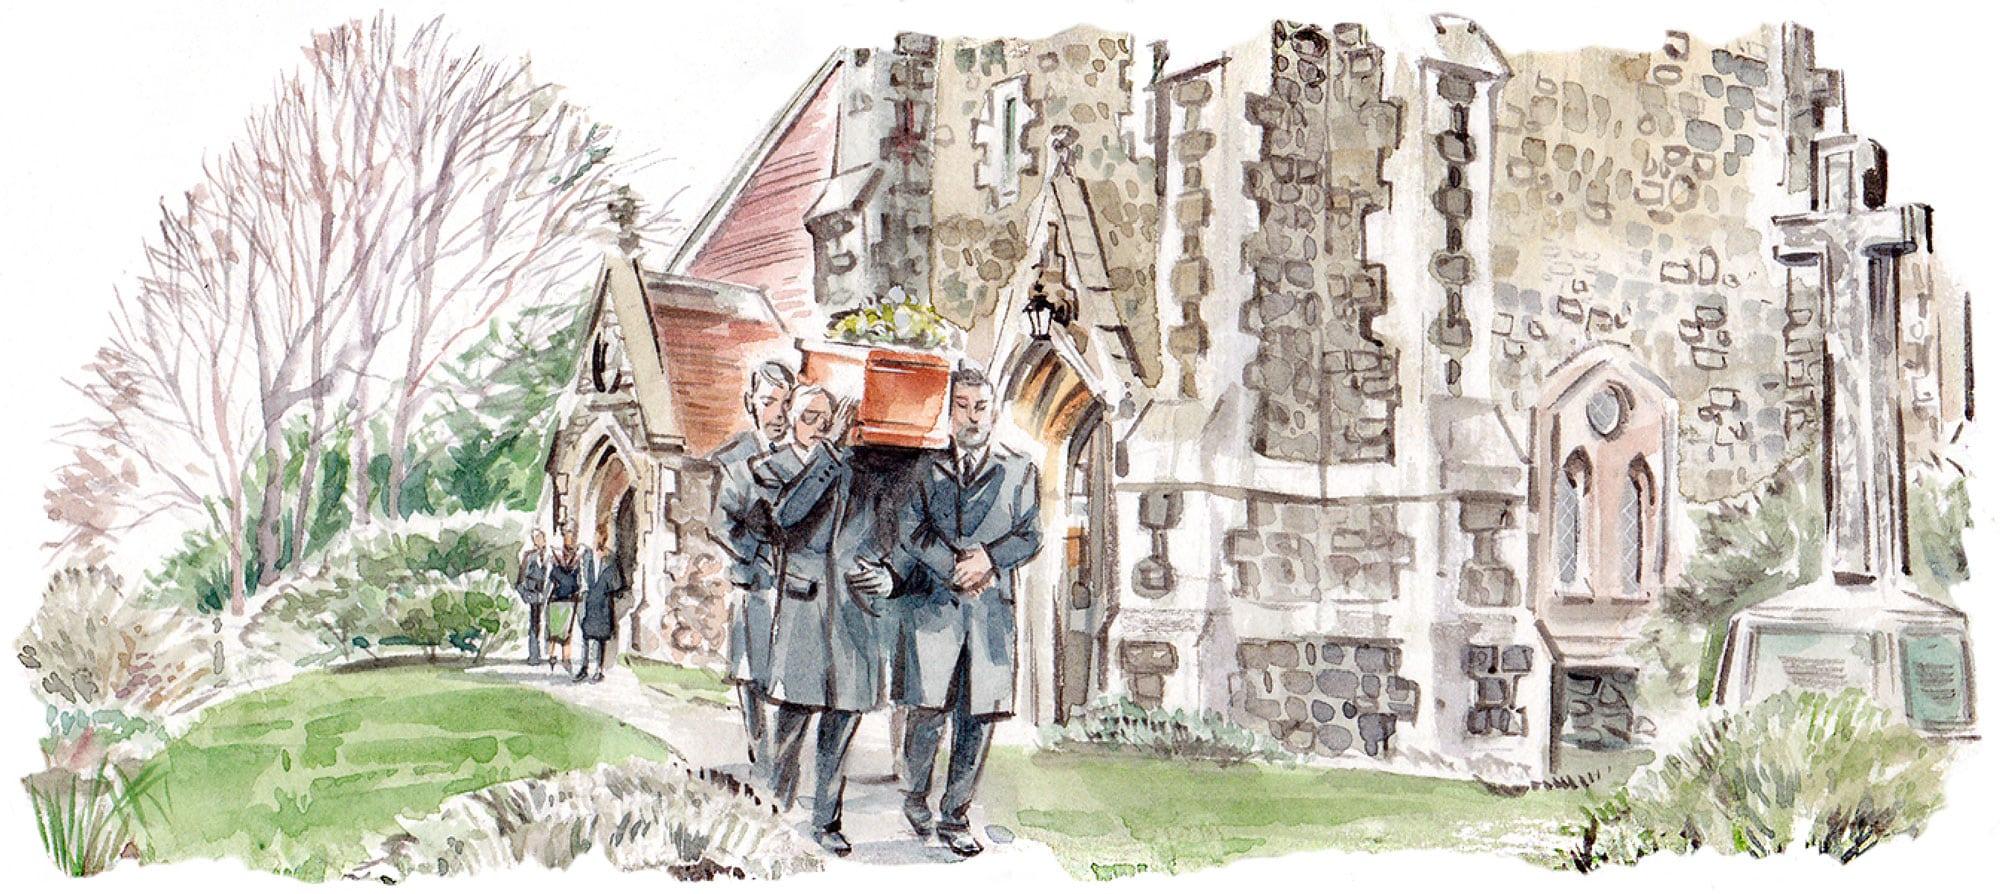 Pallbearers carrying a coffin through a churchyard illustration